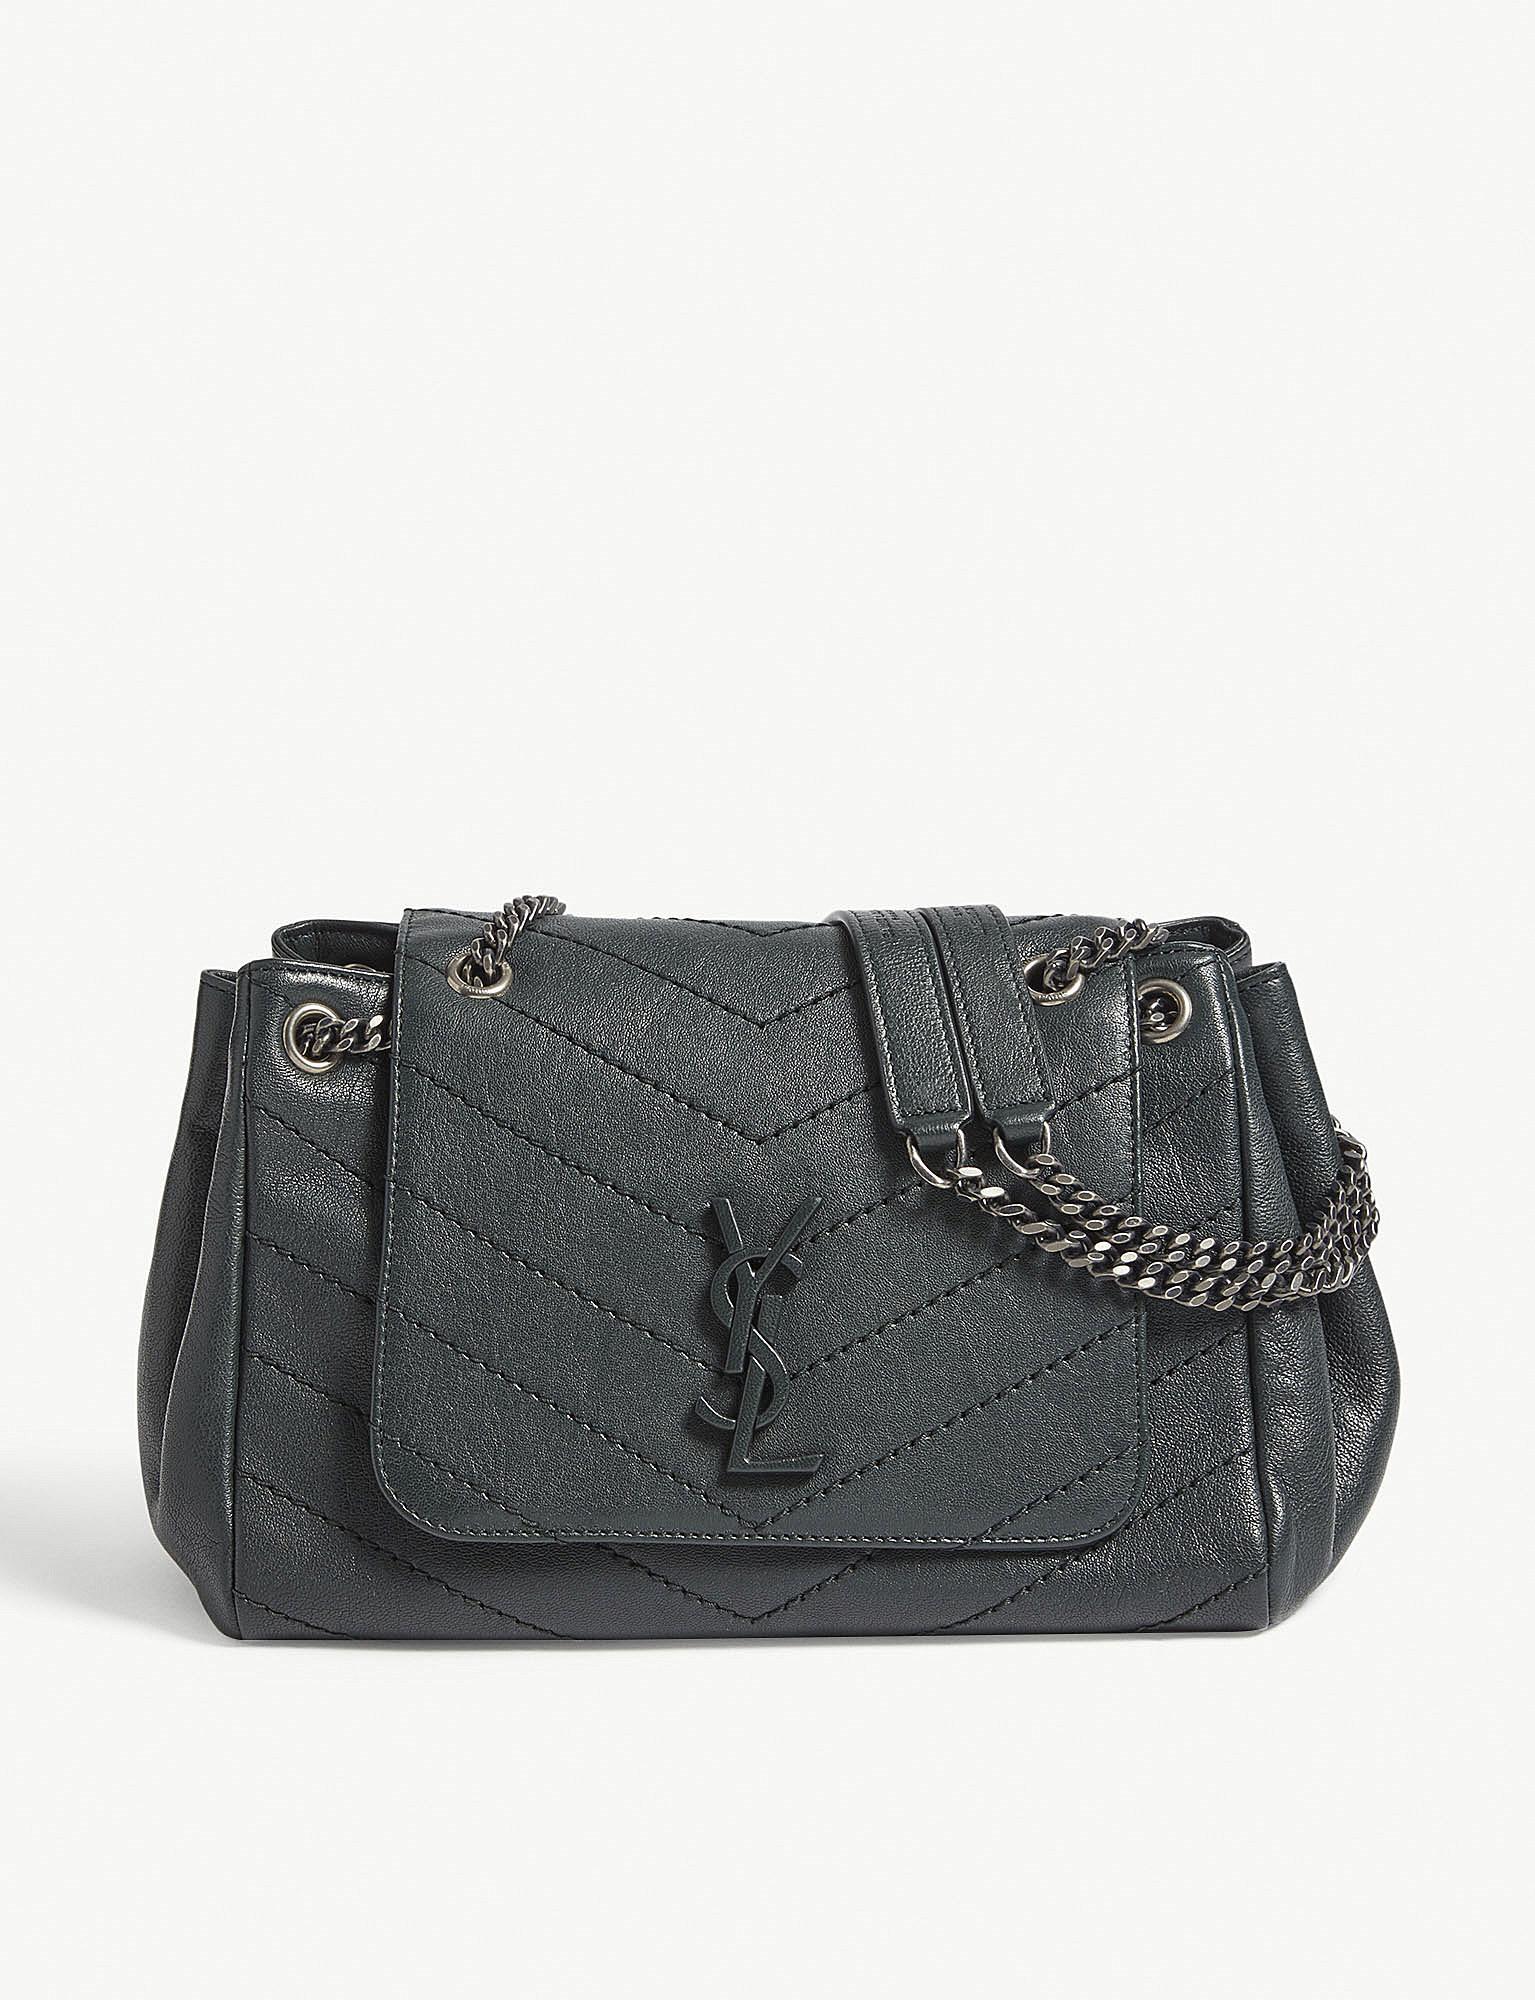 Lyst - Saint Laurent Nolita Monogram Small Leather Shoulder Bag in Black 3866671316779